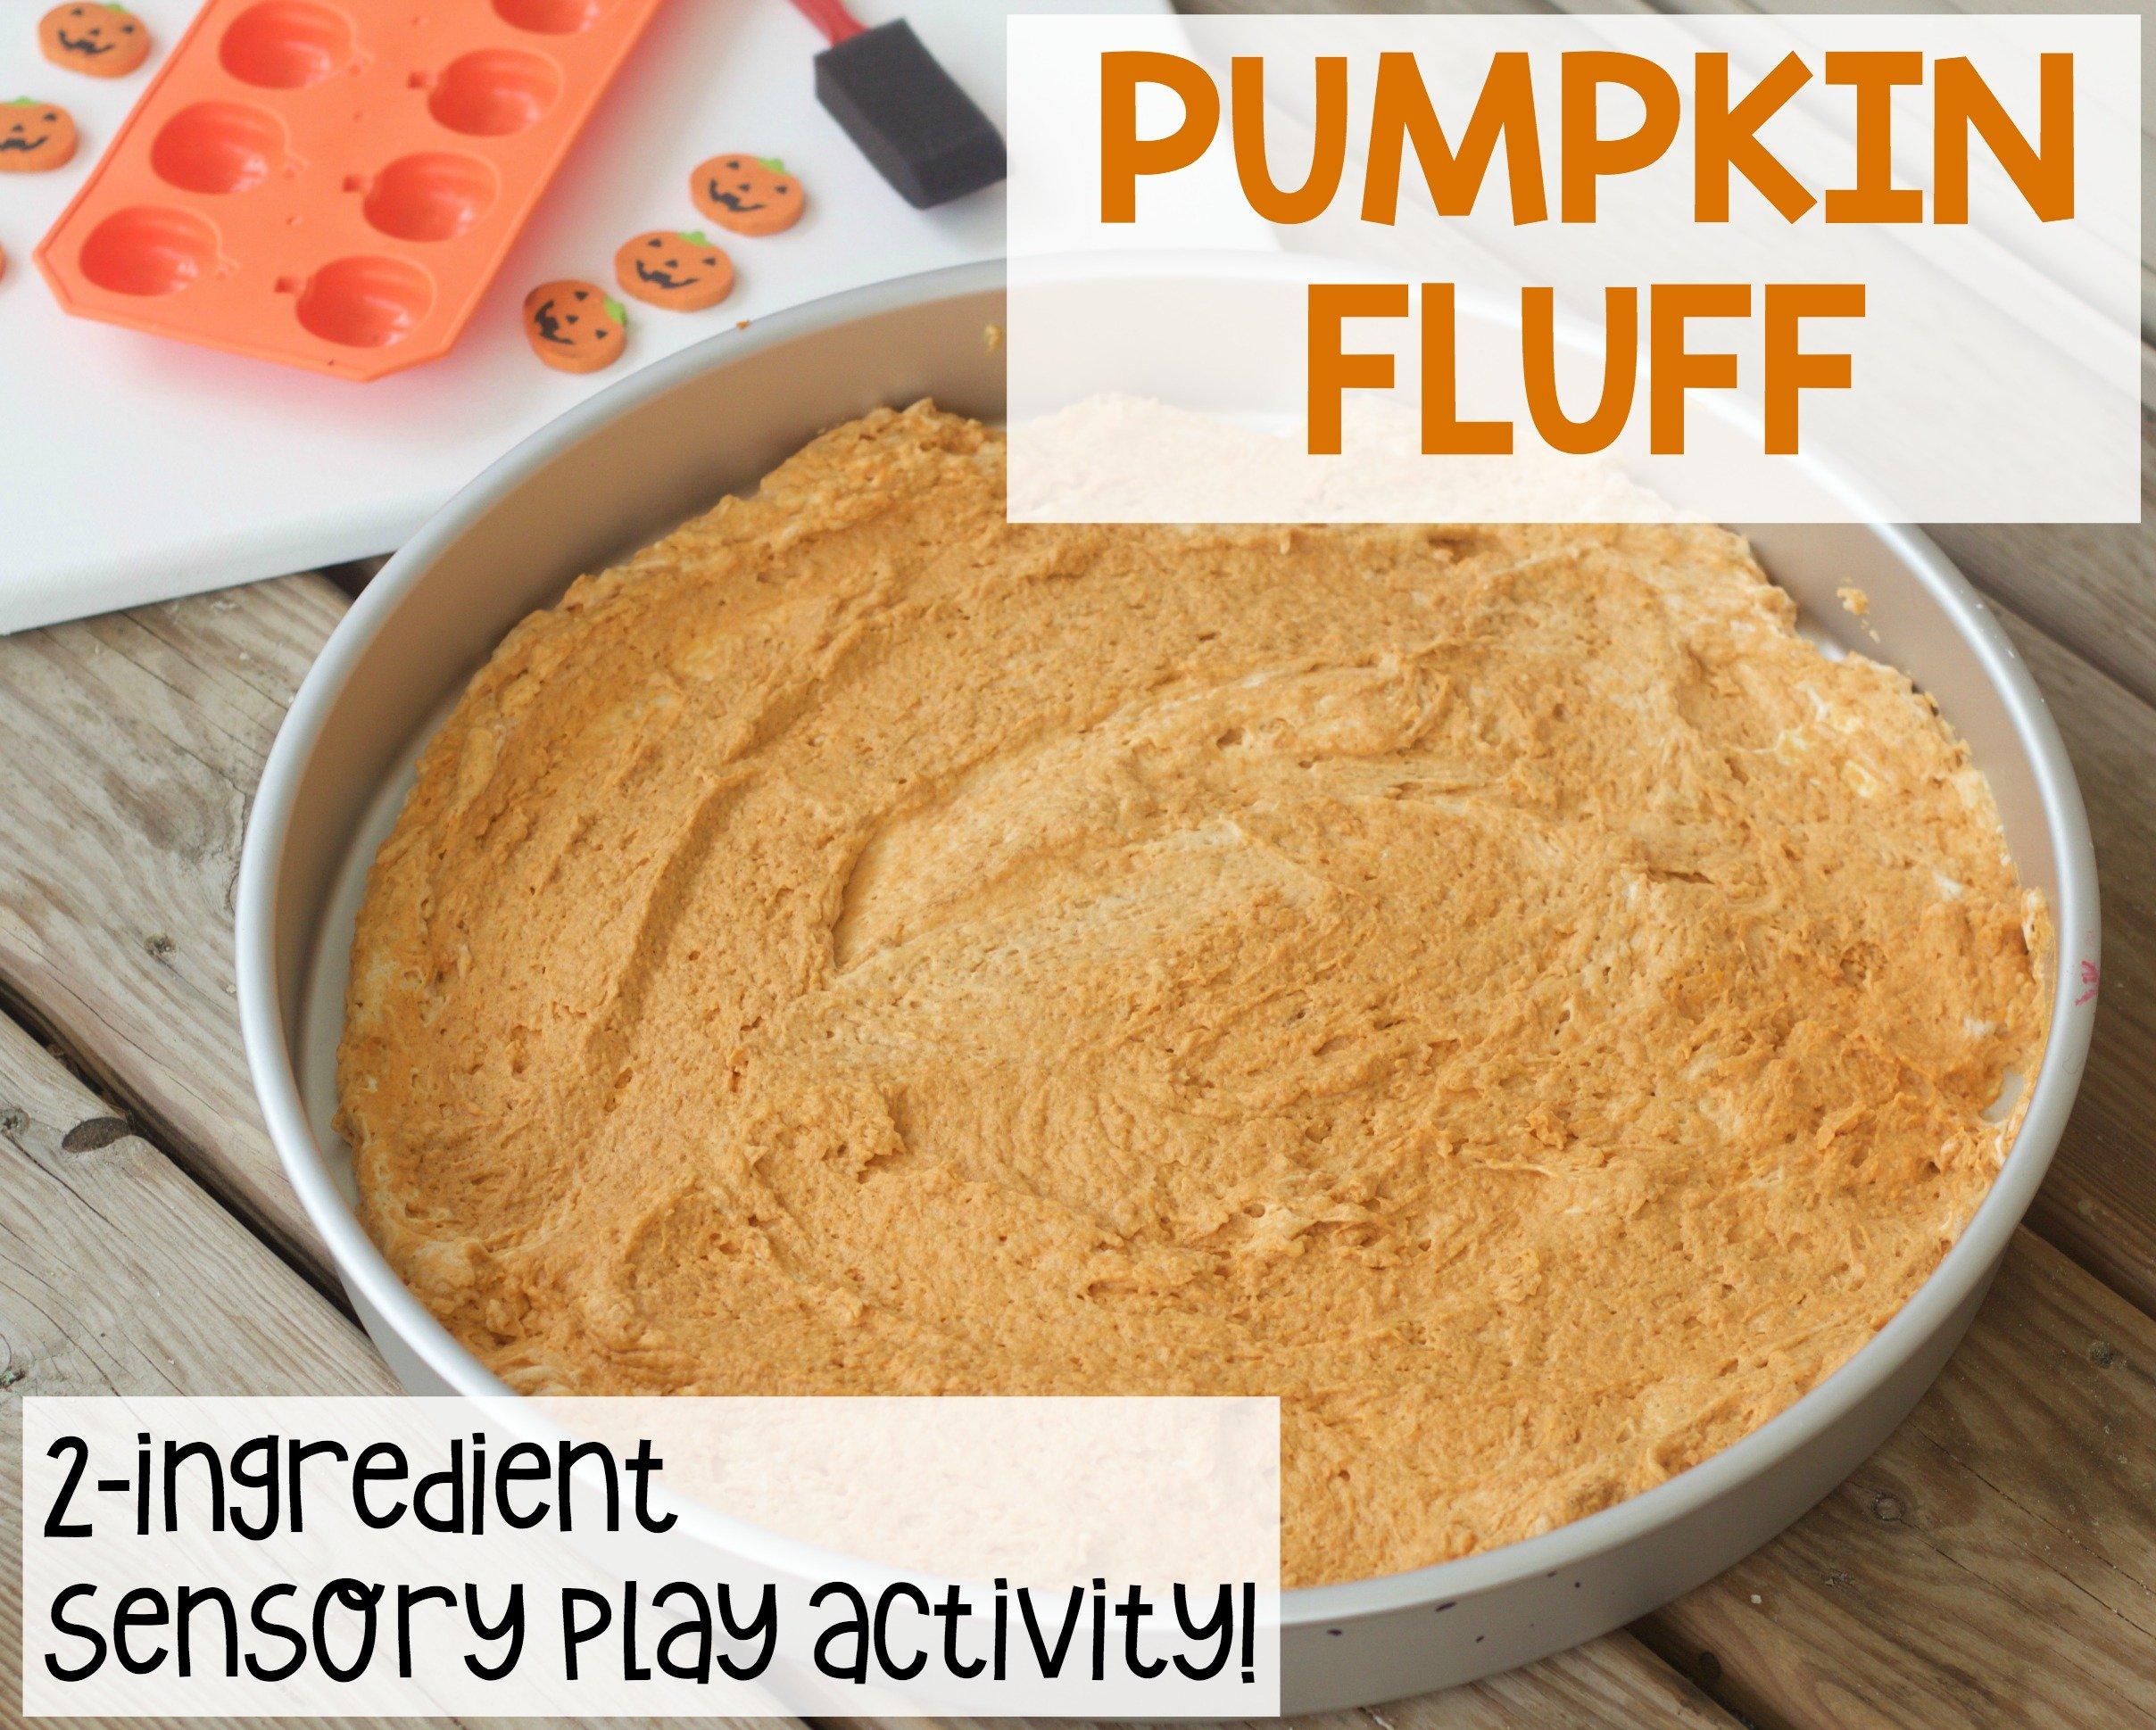 pumpkin-fluff-square